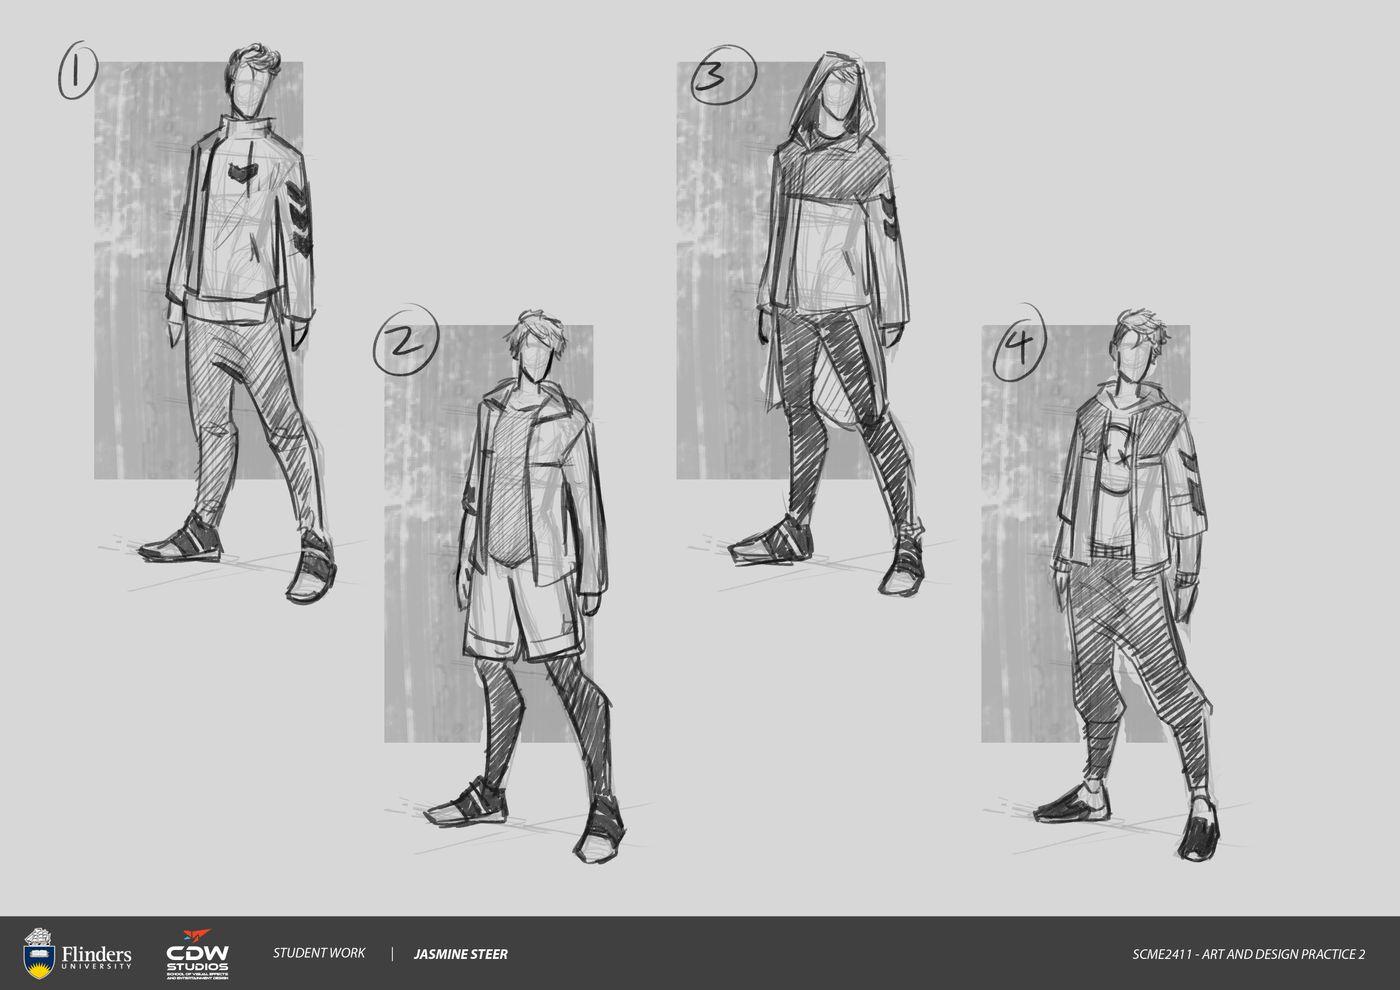 Steer Jasmine %20 Scme2411 Artand Design Practice2 Major Project %20 Thumbnails01 Jasminesteer